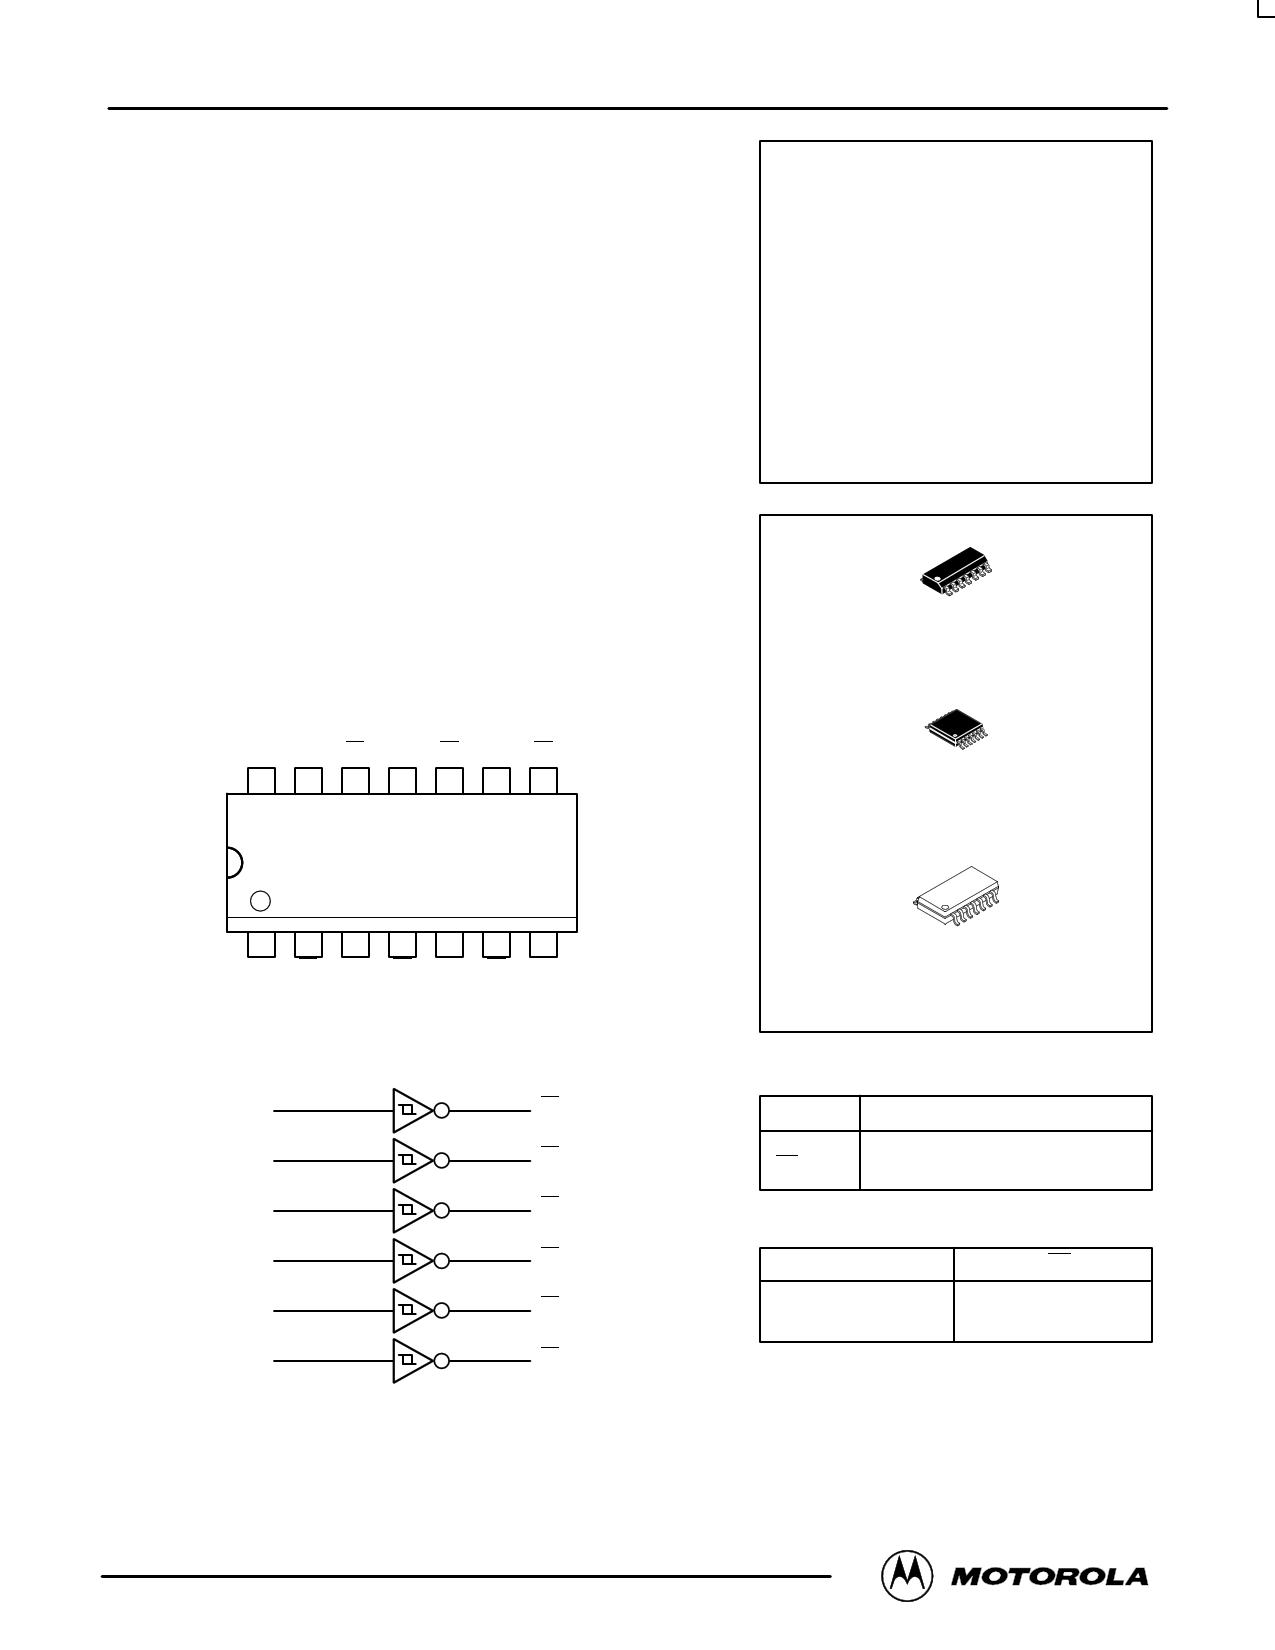 74LVX14 دیتاشیت PDF